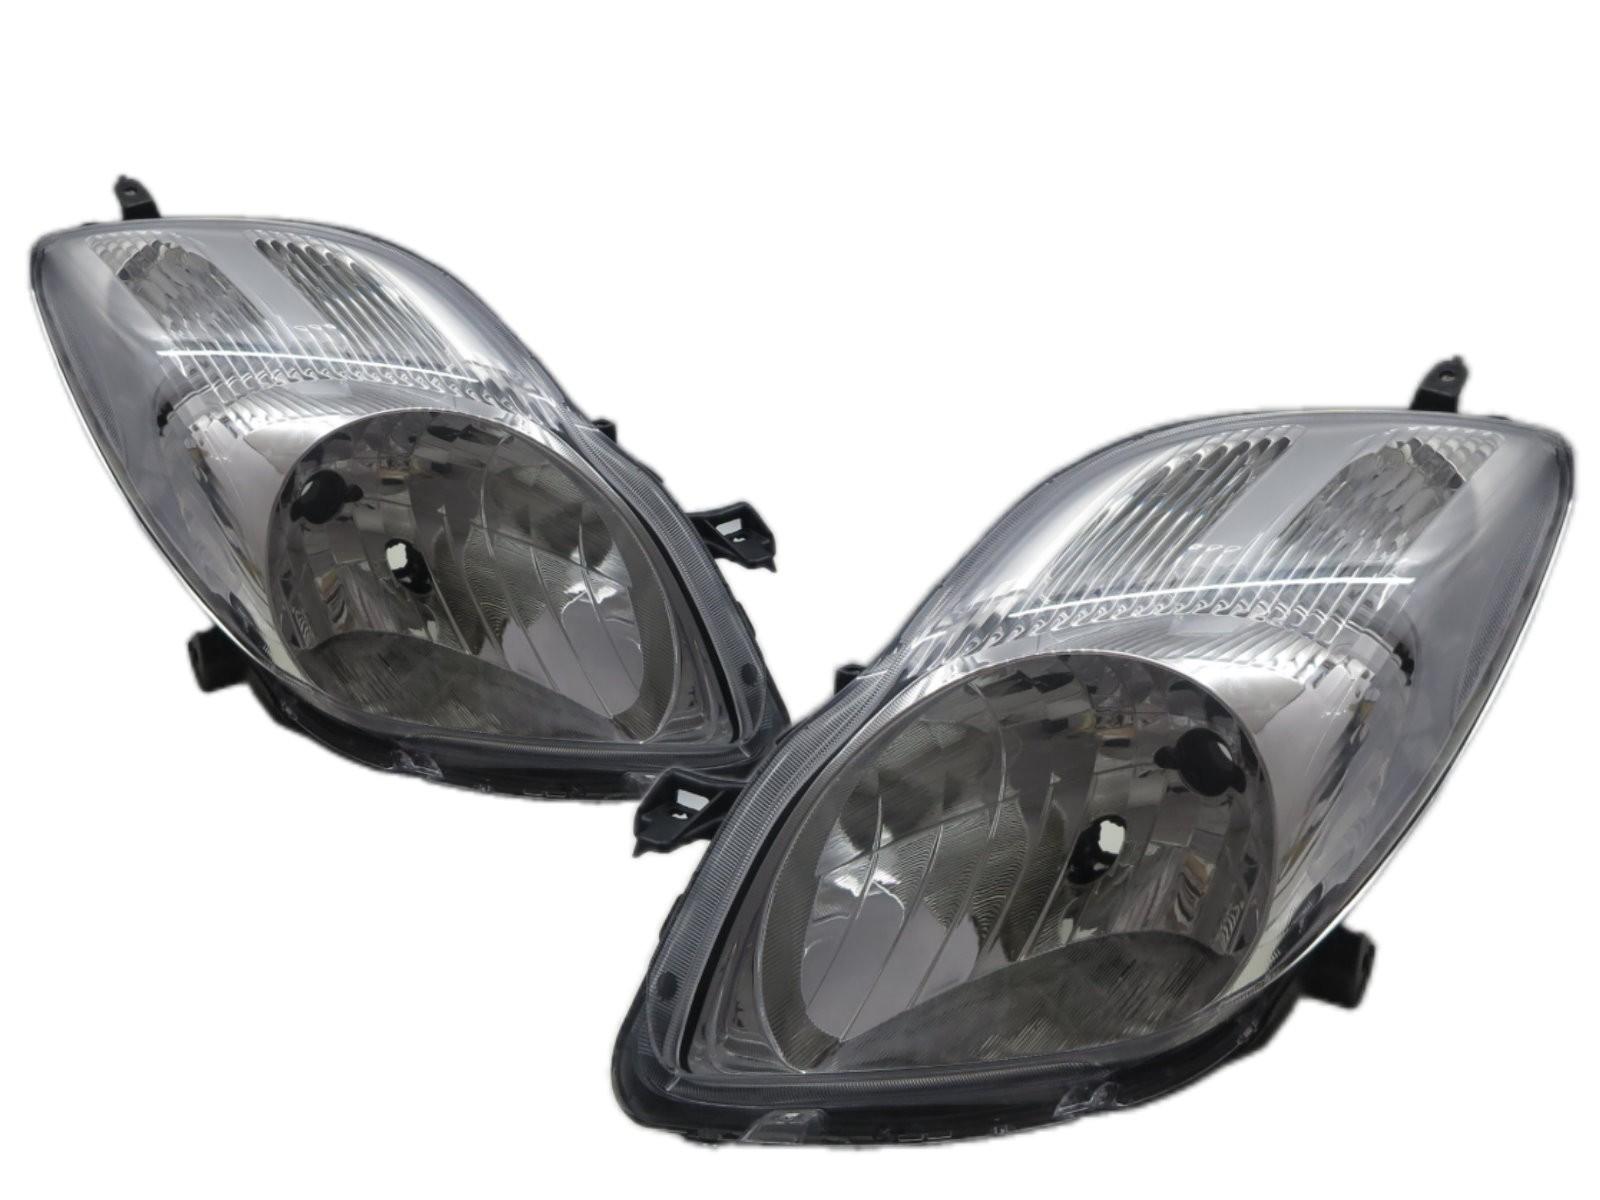 CrazyTheGod Charade XP90 2011-2013 Hatchback 3D/5D Clear Headlight Headlamp Chrome for DAIHATSU LHD